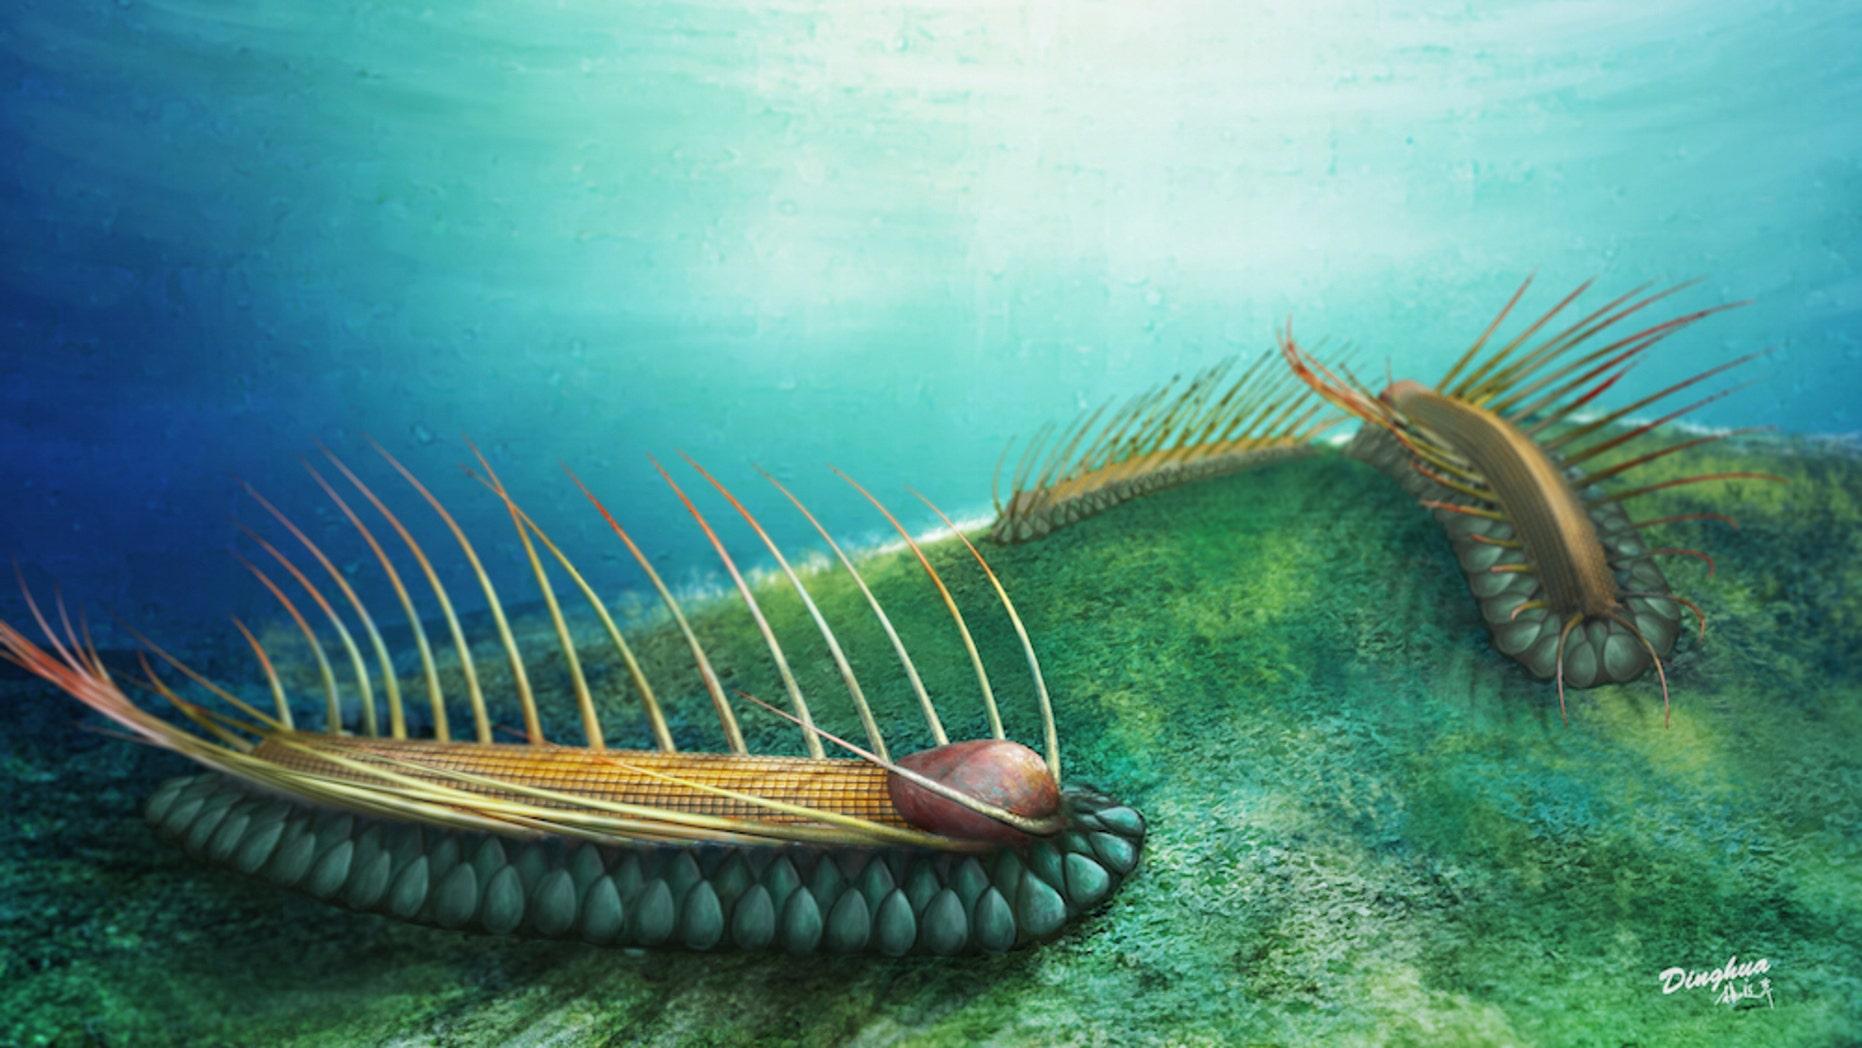 An artist's interpretation of the spiky <i>Orthrozanclus elongata</i>